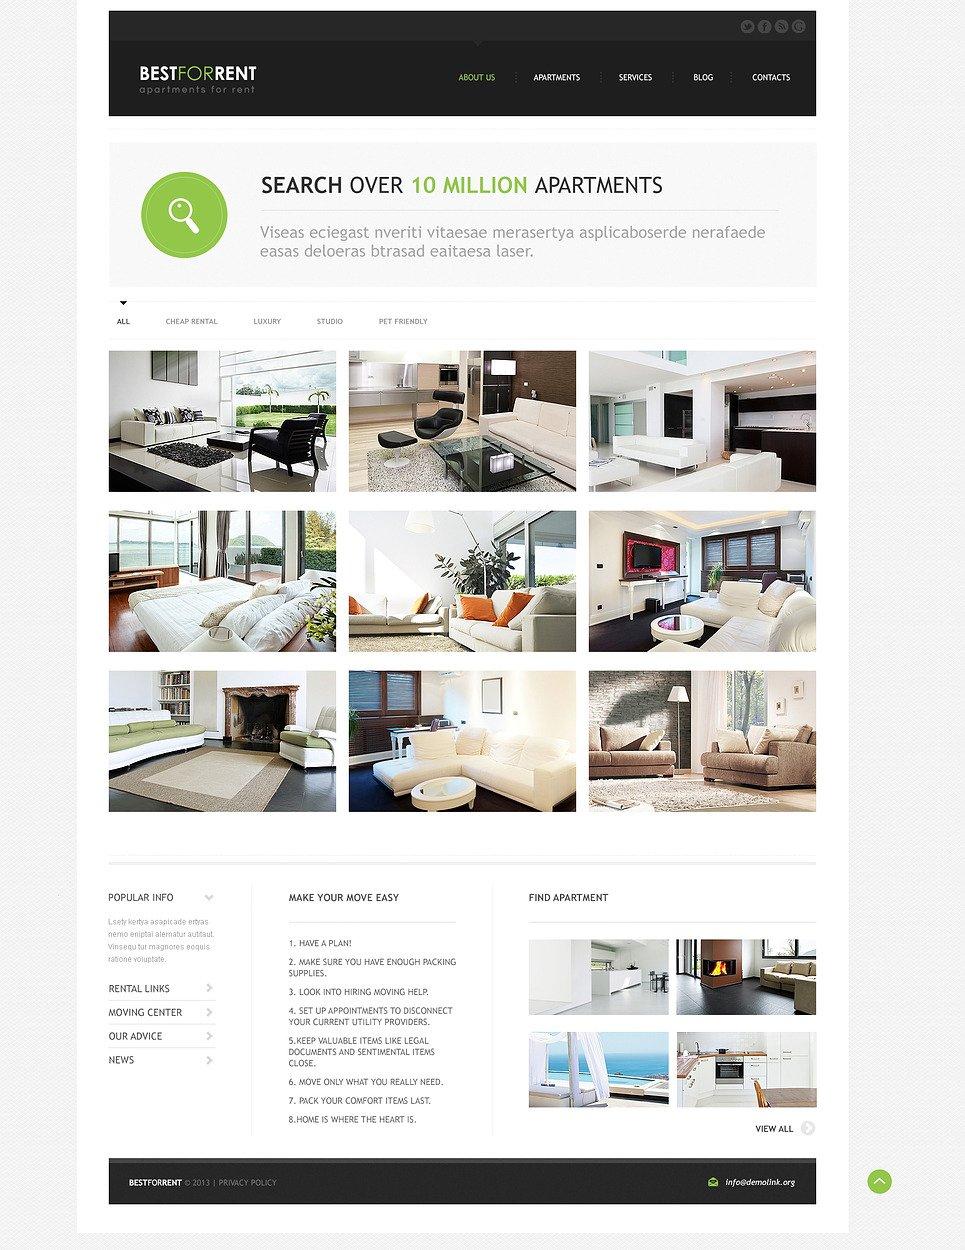 Nice Apartments For Rent Joomla Template New Screenshots BIG